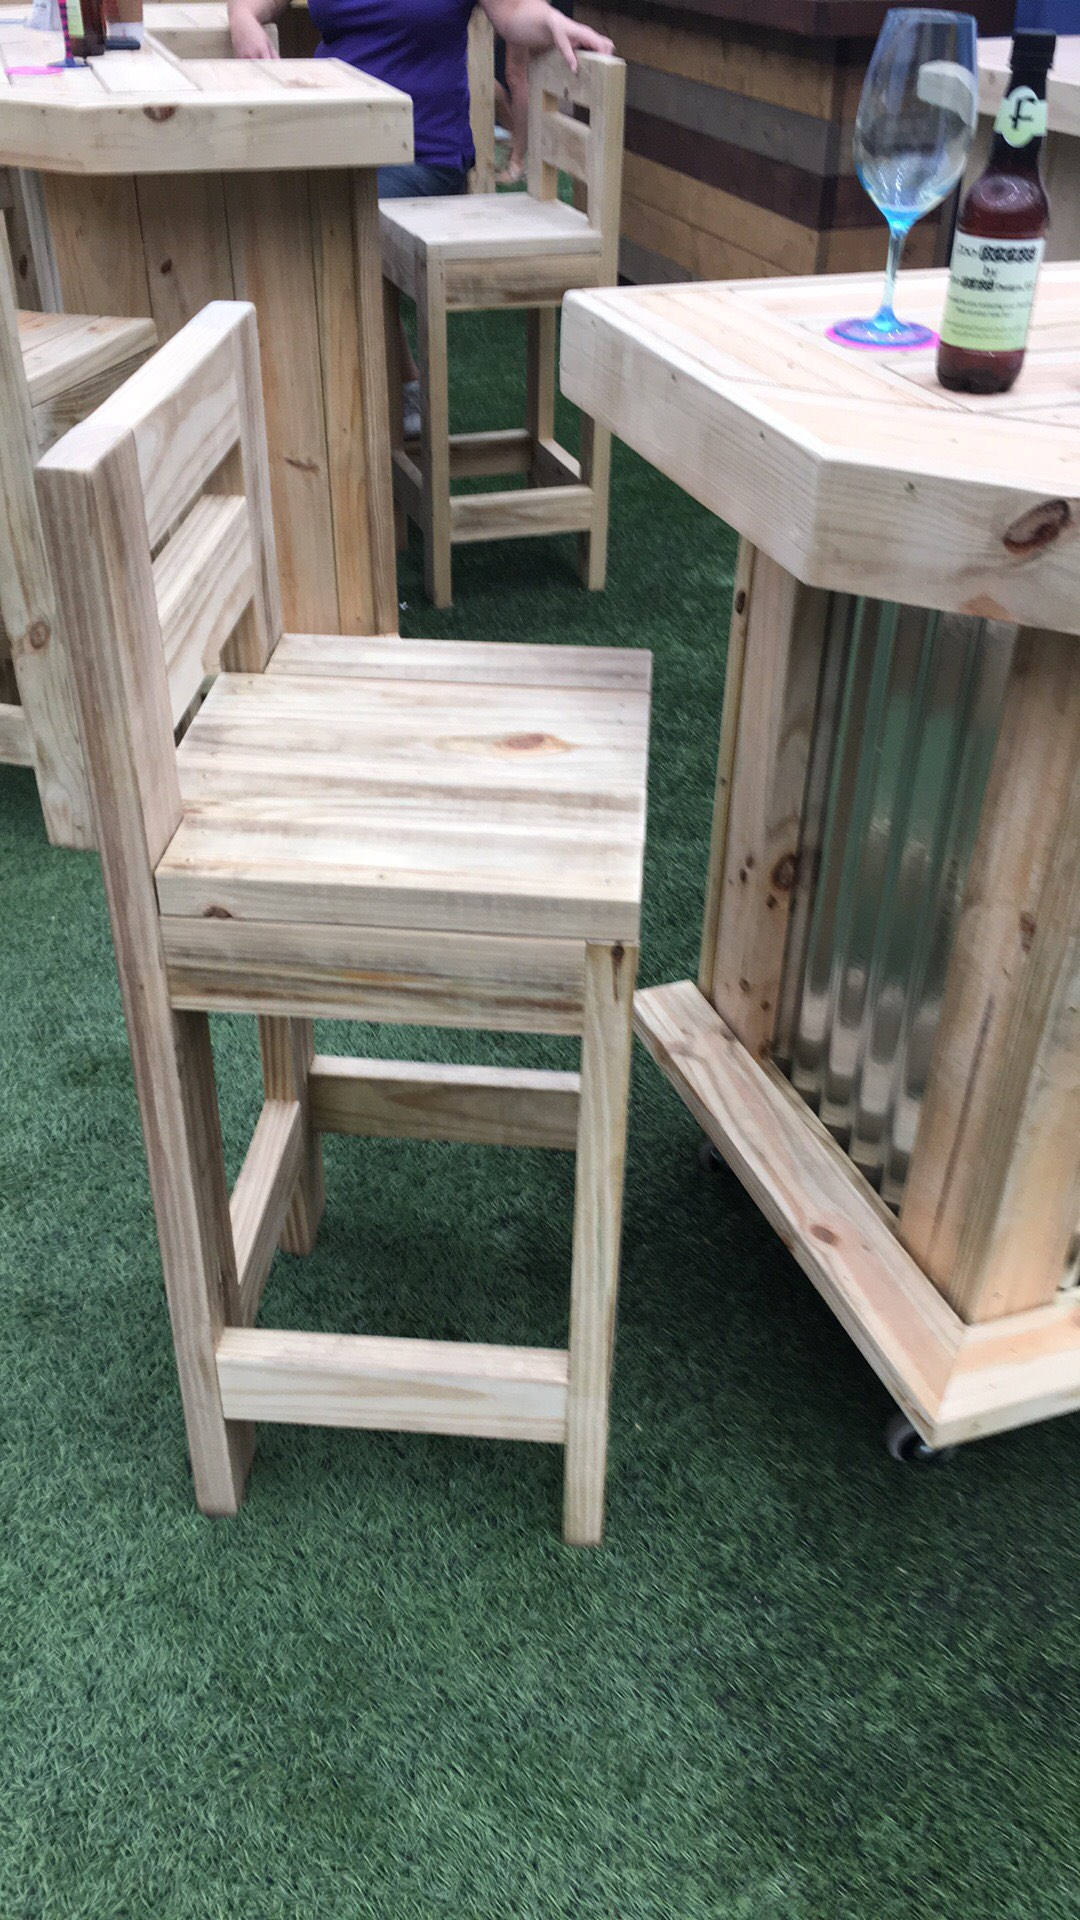 Exterior Bar Stool - Durable Rustic outdoor Bar stools, hand made ...